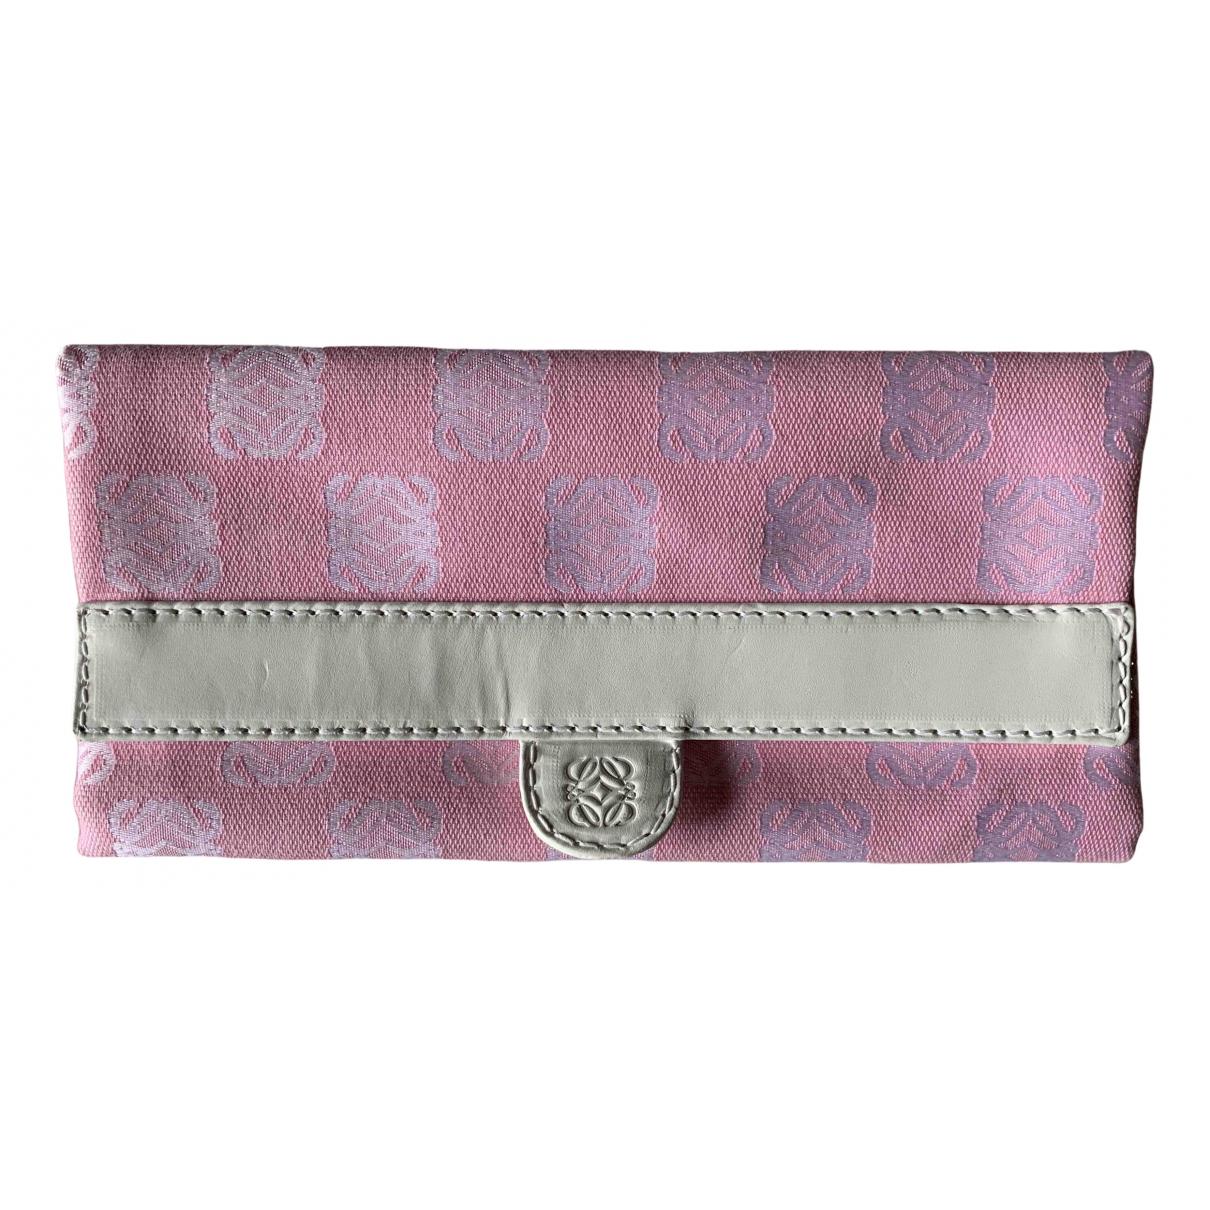 Loewe - Petite maroquinerie   pour femme en toile - rose